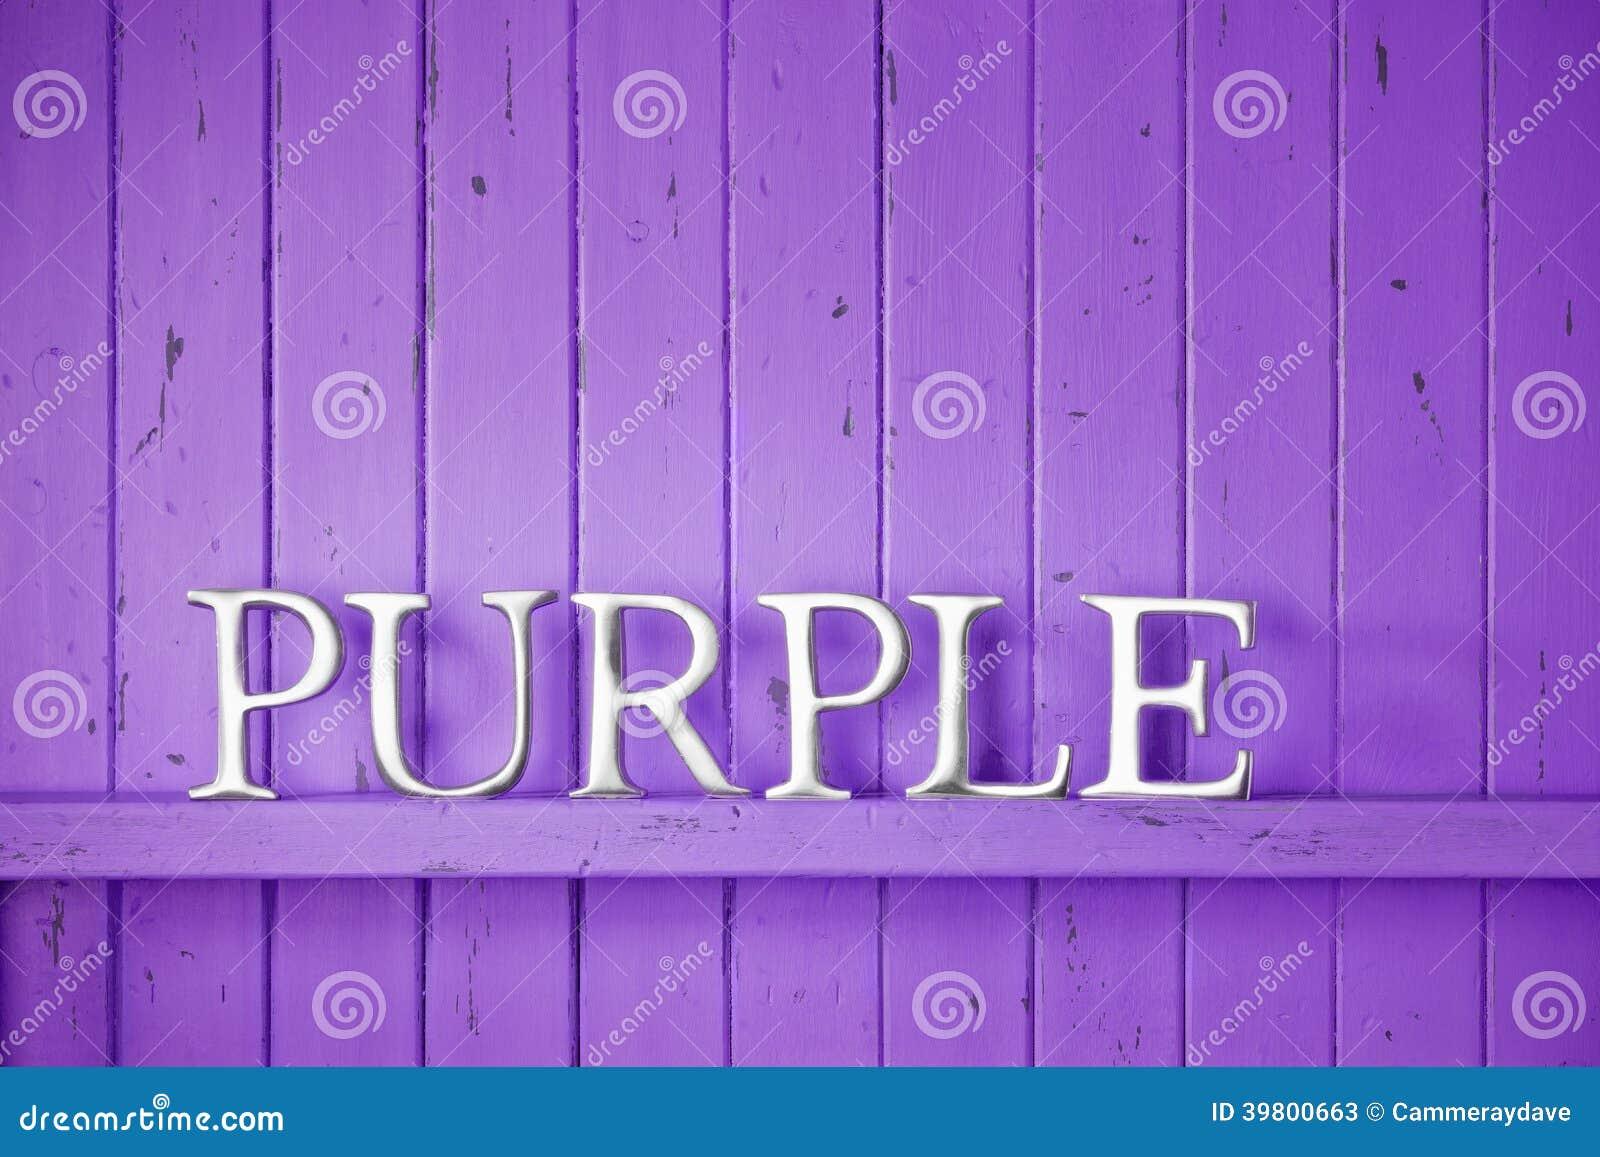 purple color word background stock image image of violet design